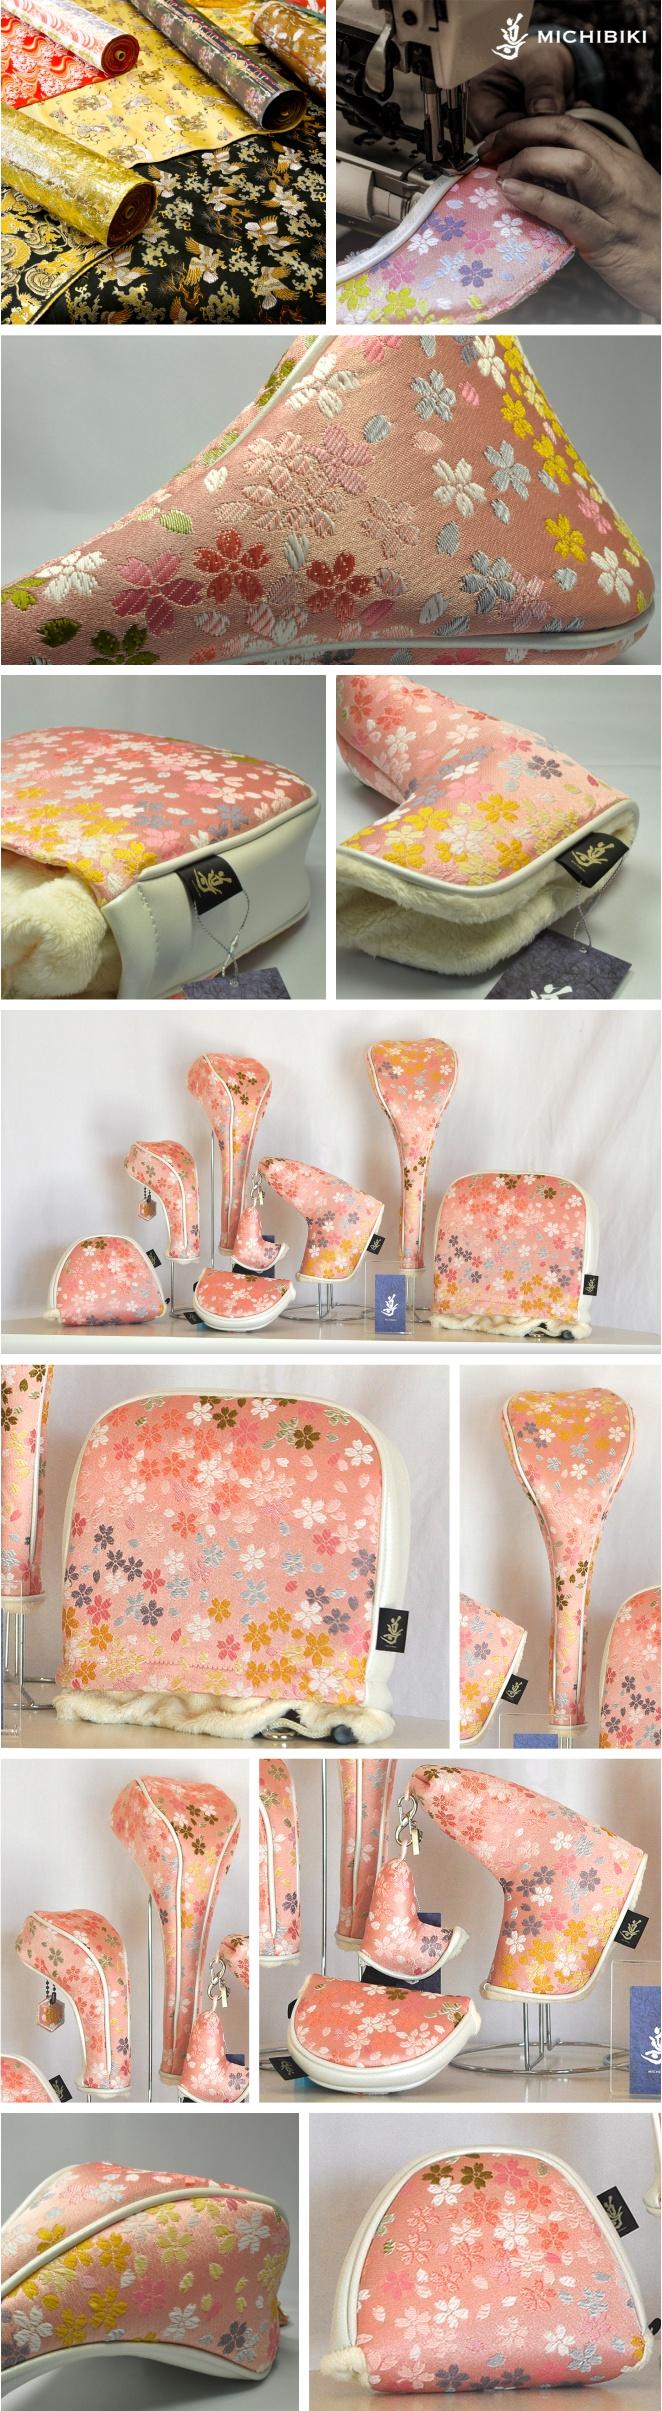 Michibiki Brocade Sakura Full Bloom Head Cover